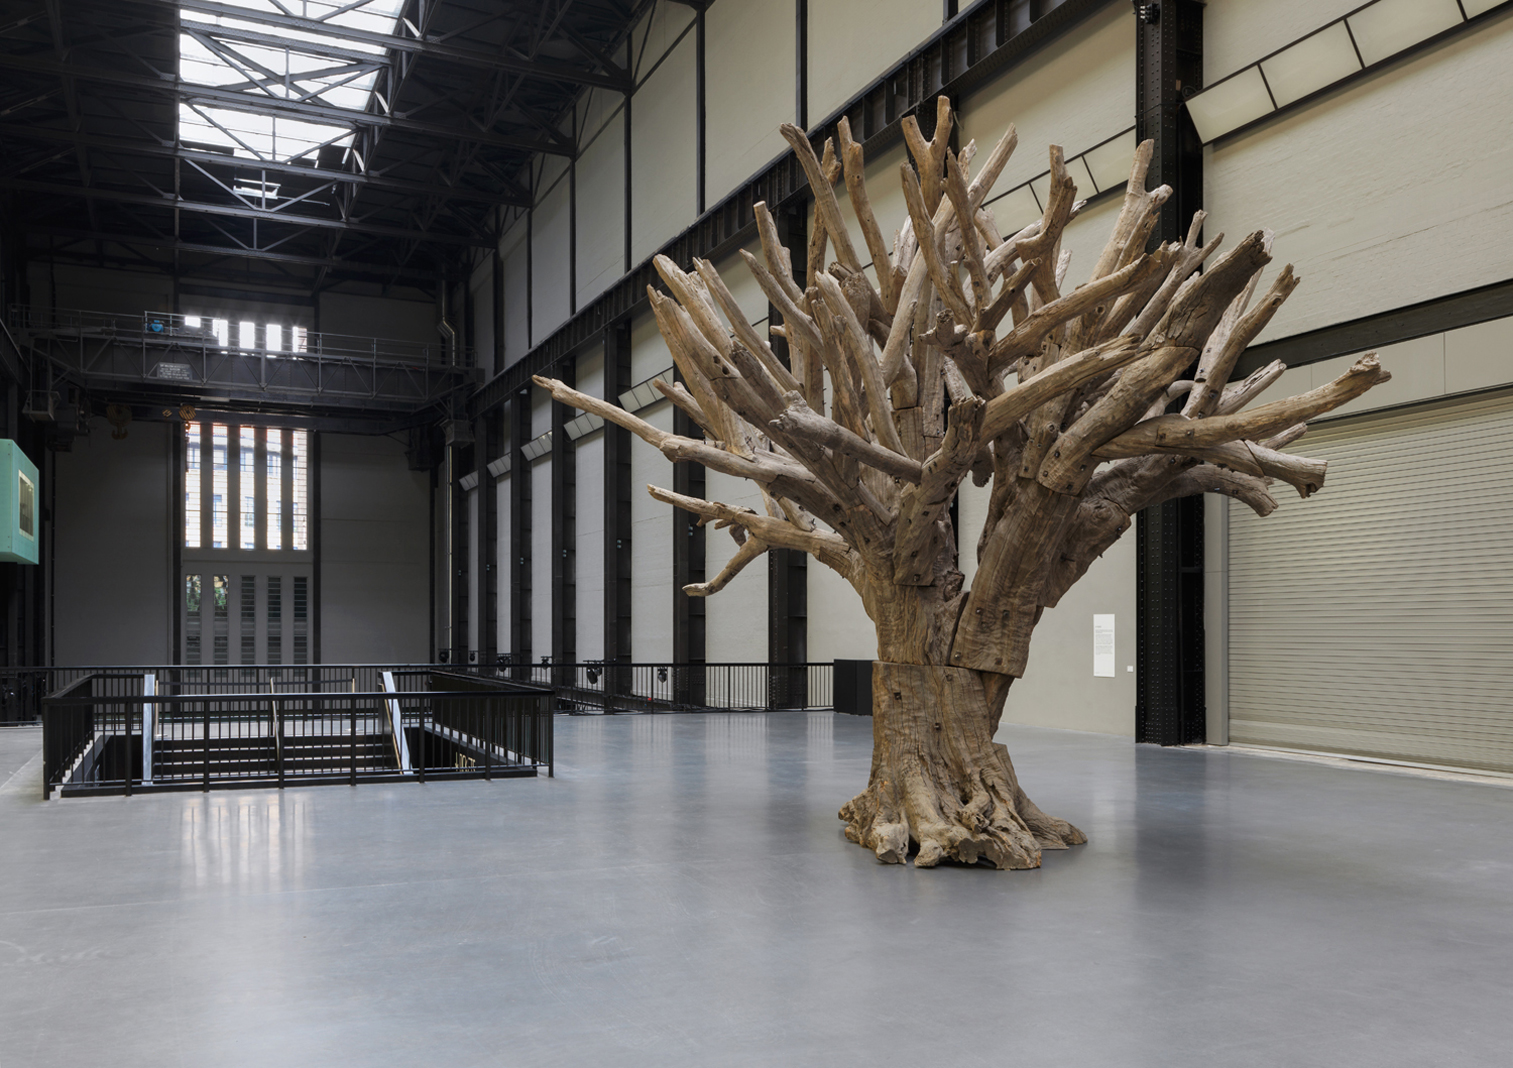 Ai Weiwei, 'Tree', 2010. © Ai Weiwei Studio; Courtesy Lisson Gallery